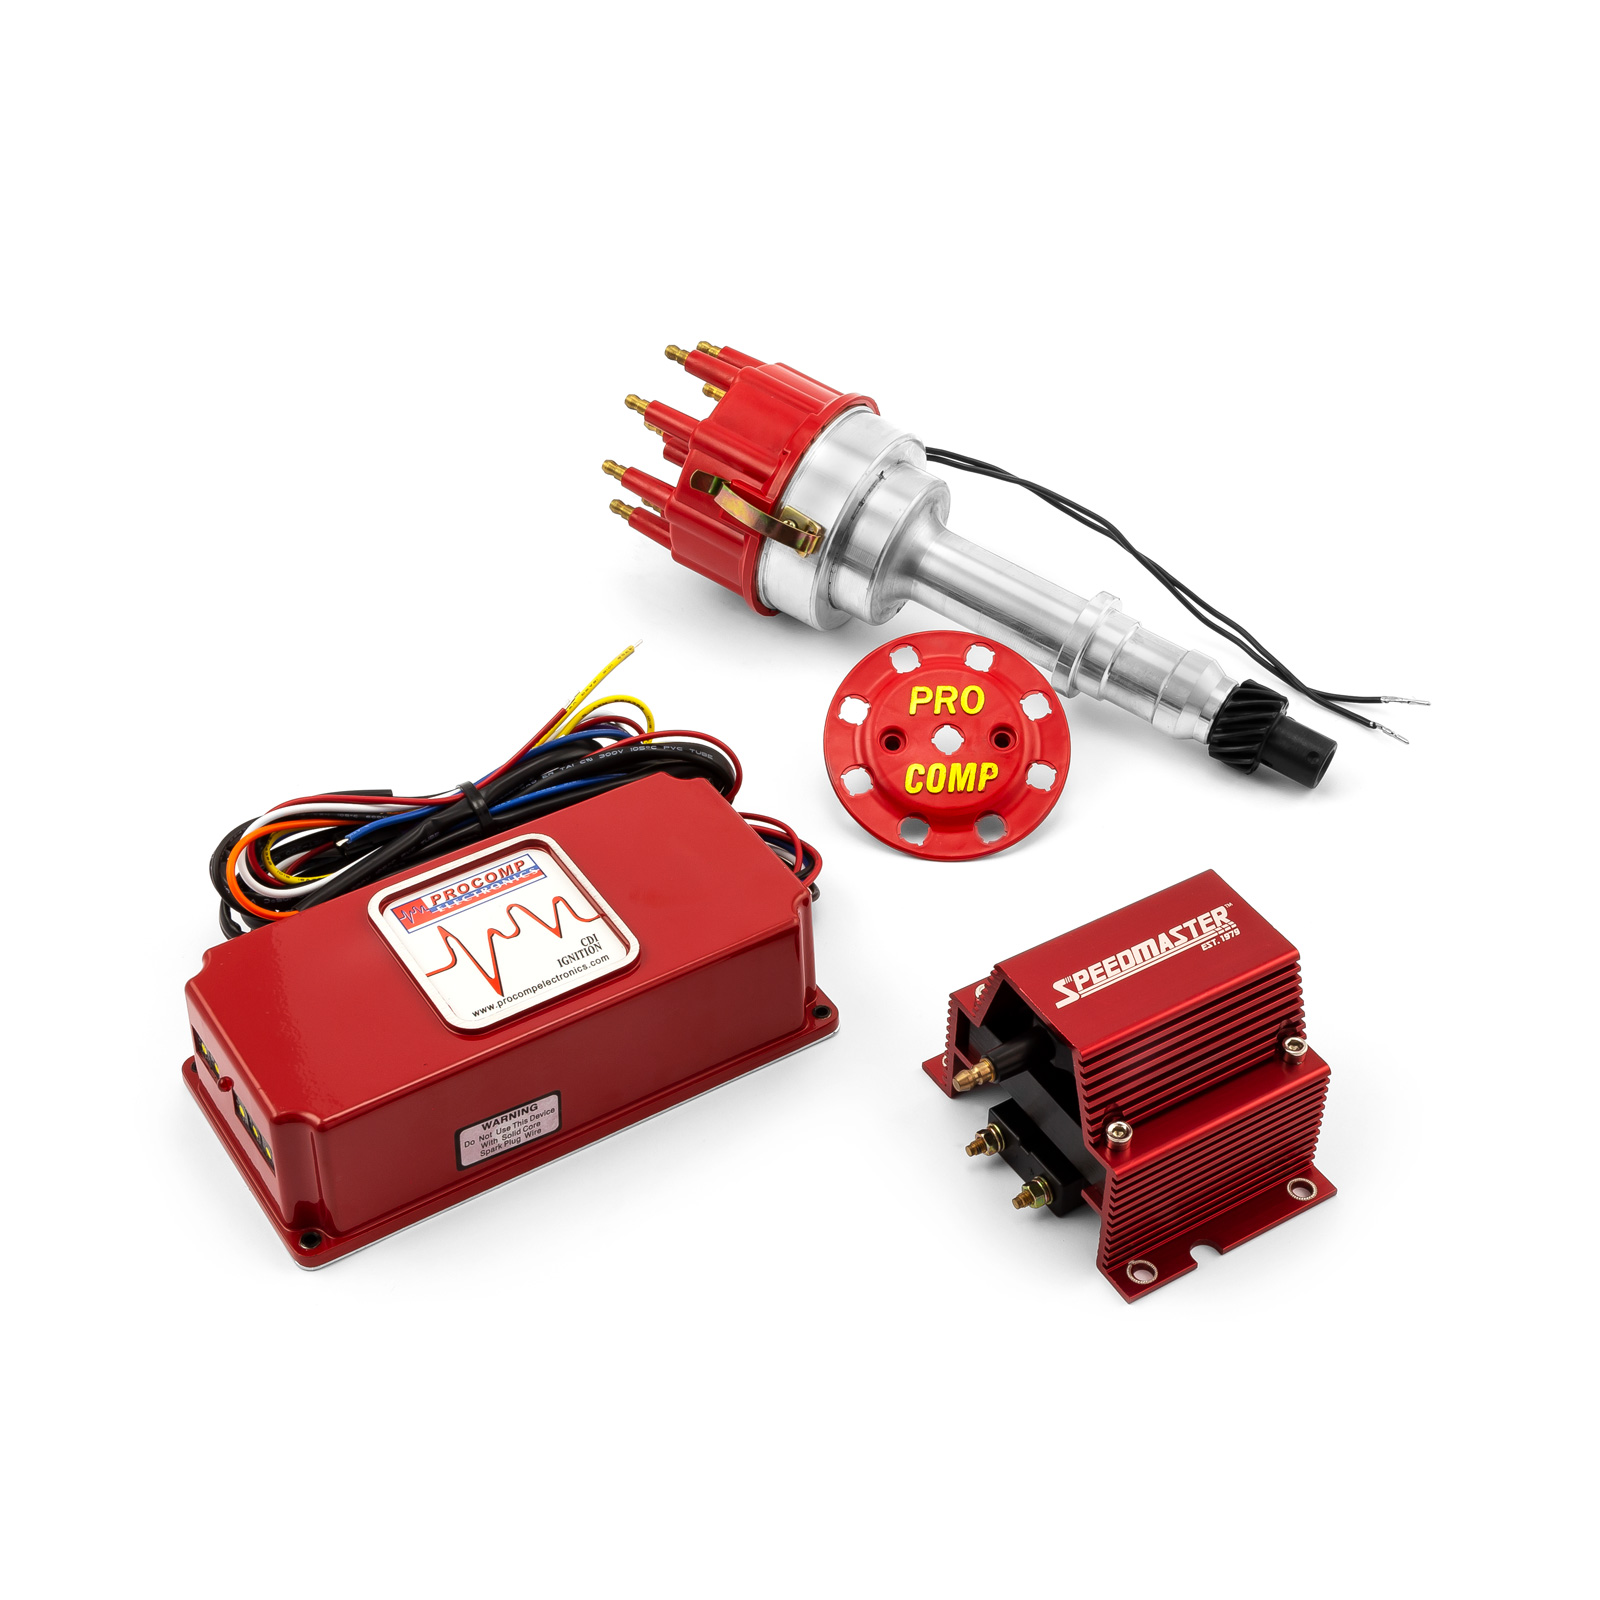 Pontiac 326 400 455 Pro Billet Distributor 6AL CDI Ignition & Coil Kit